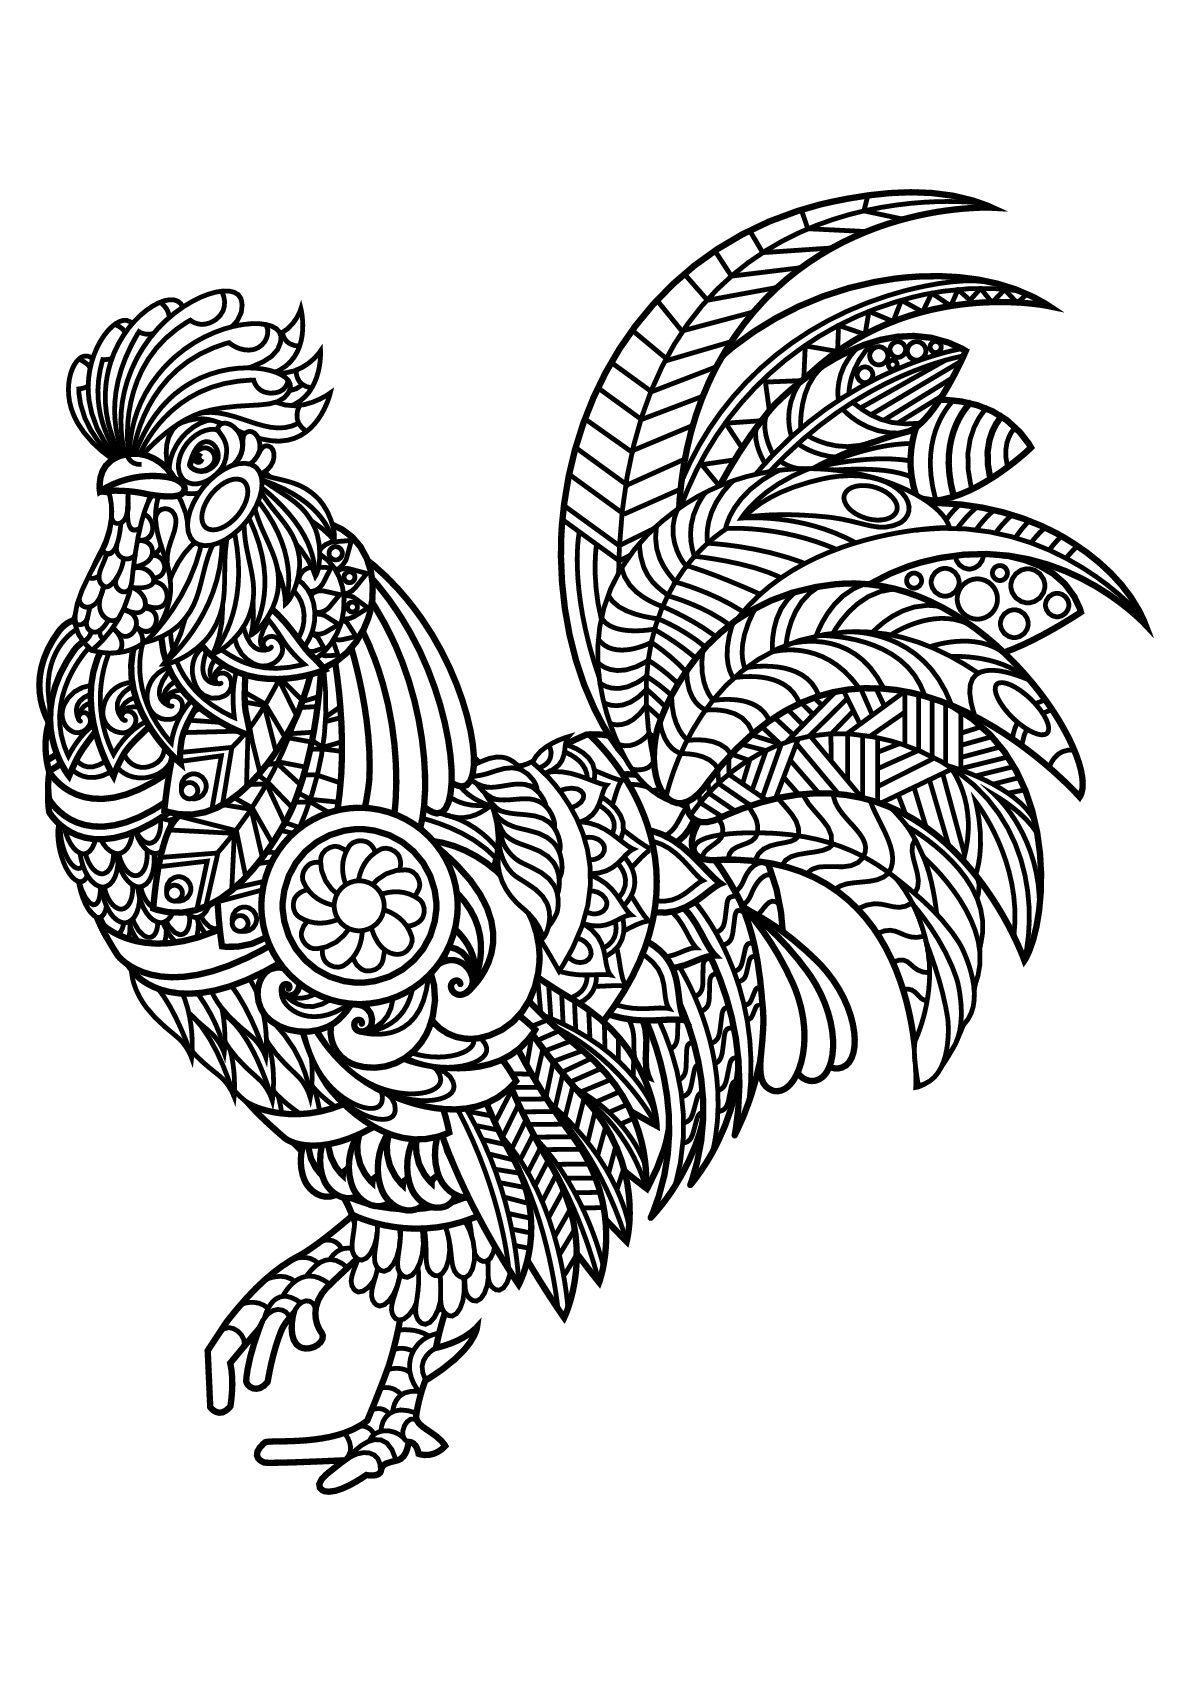 Pin By Sarka Hlahulkova On Coloring Anti Stress Raskraski Antistress Animal Coloring Pages Bird Coloring Pages Mandala Coloring Pages [ 1684 x 1191 Pixel ]